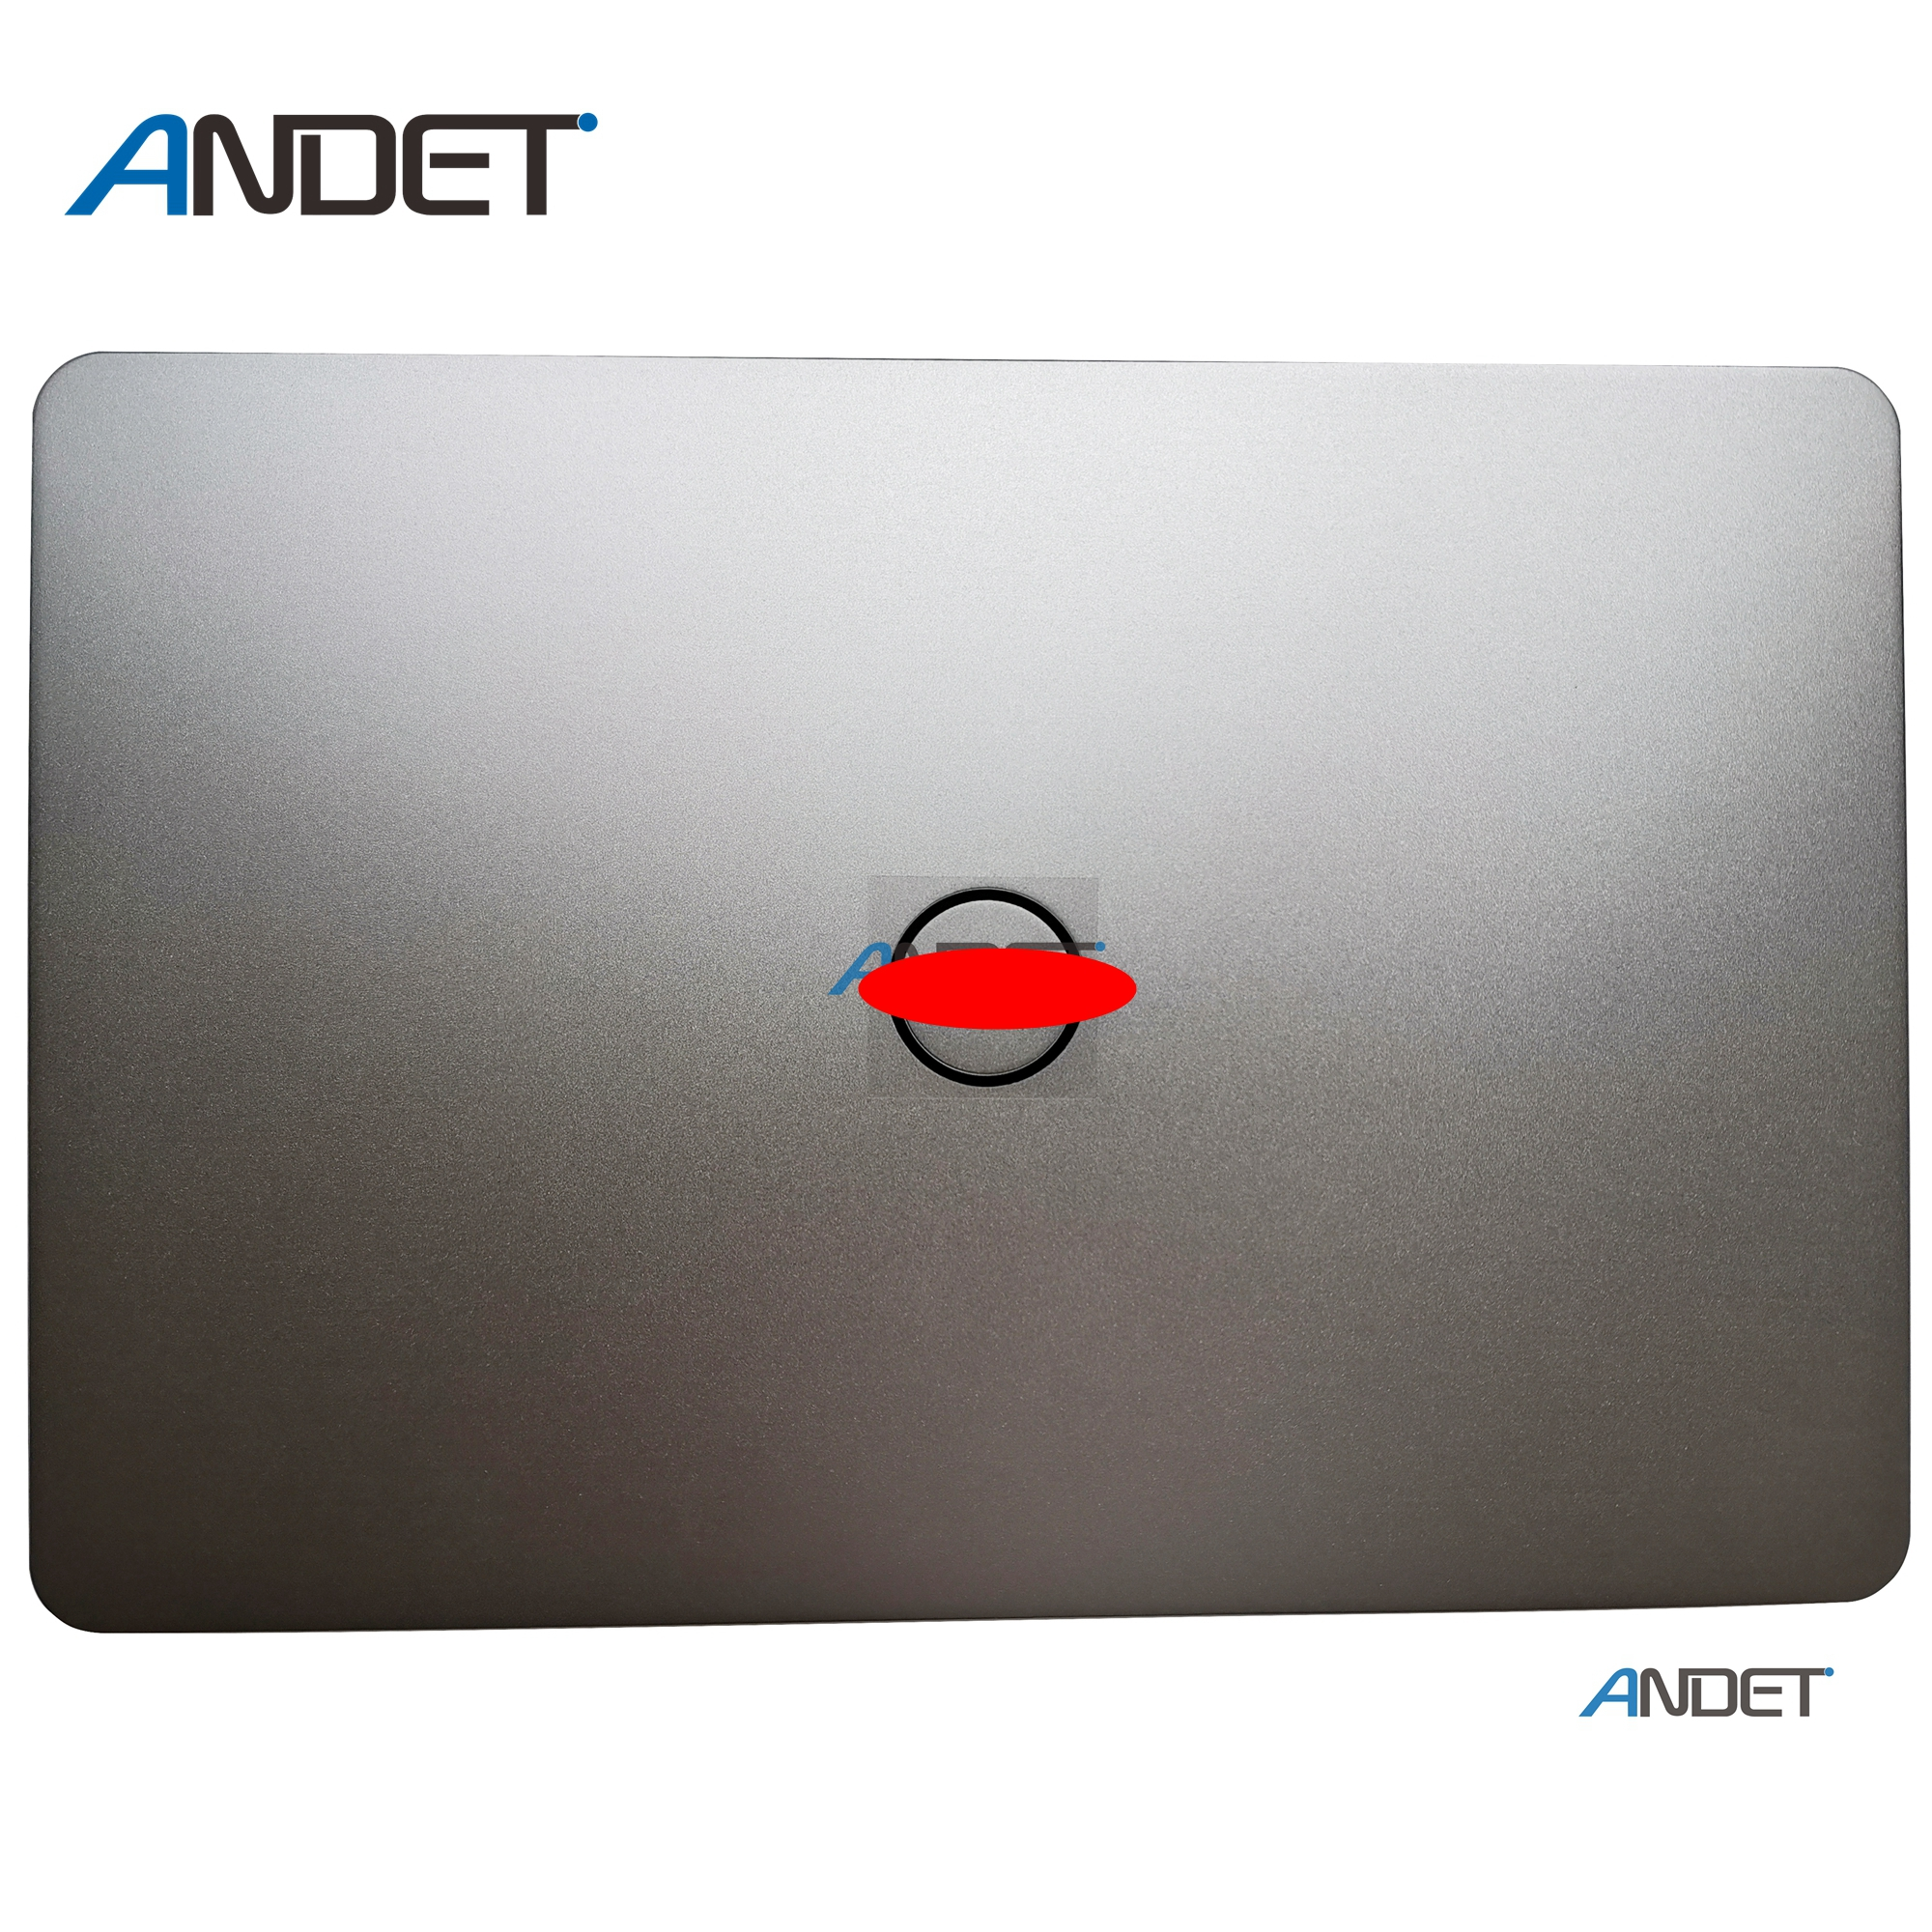 New For Dell Inspiron 15D 7000 7570 Bottom Base Case Cover 021CC9 0VT5GN